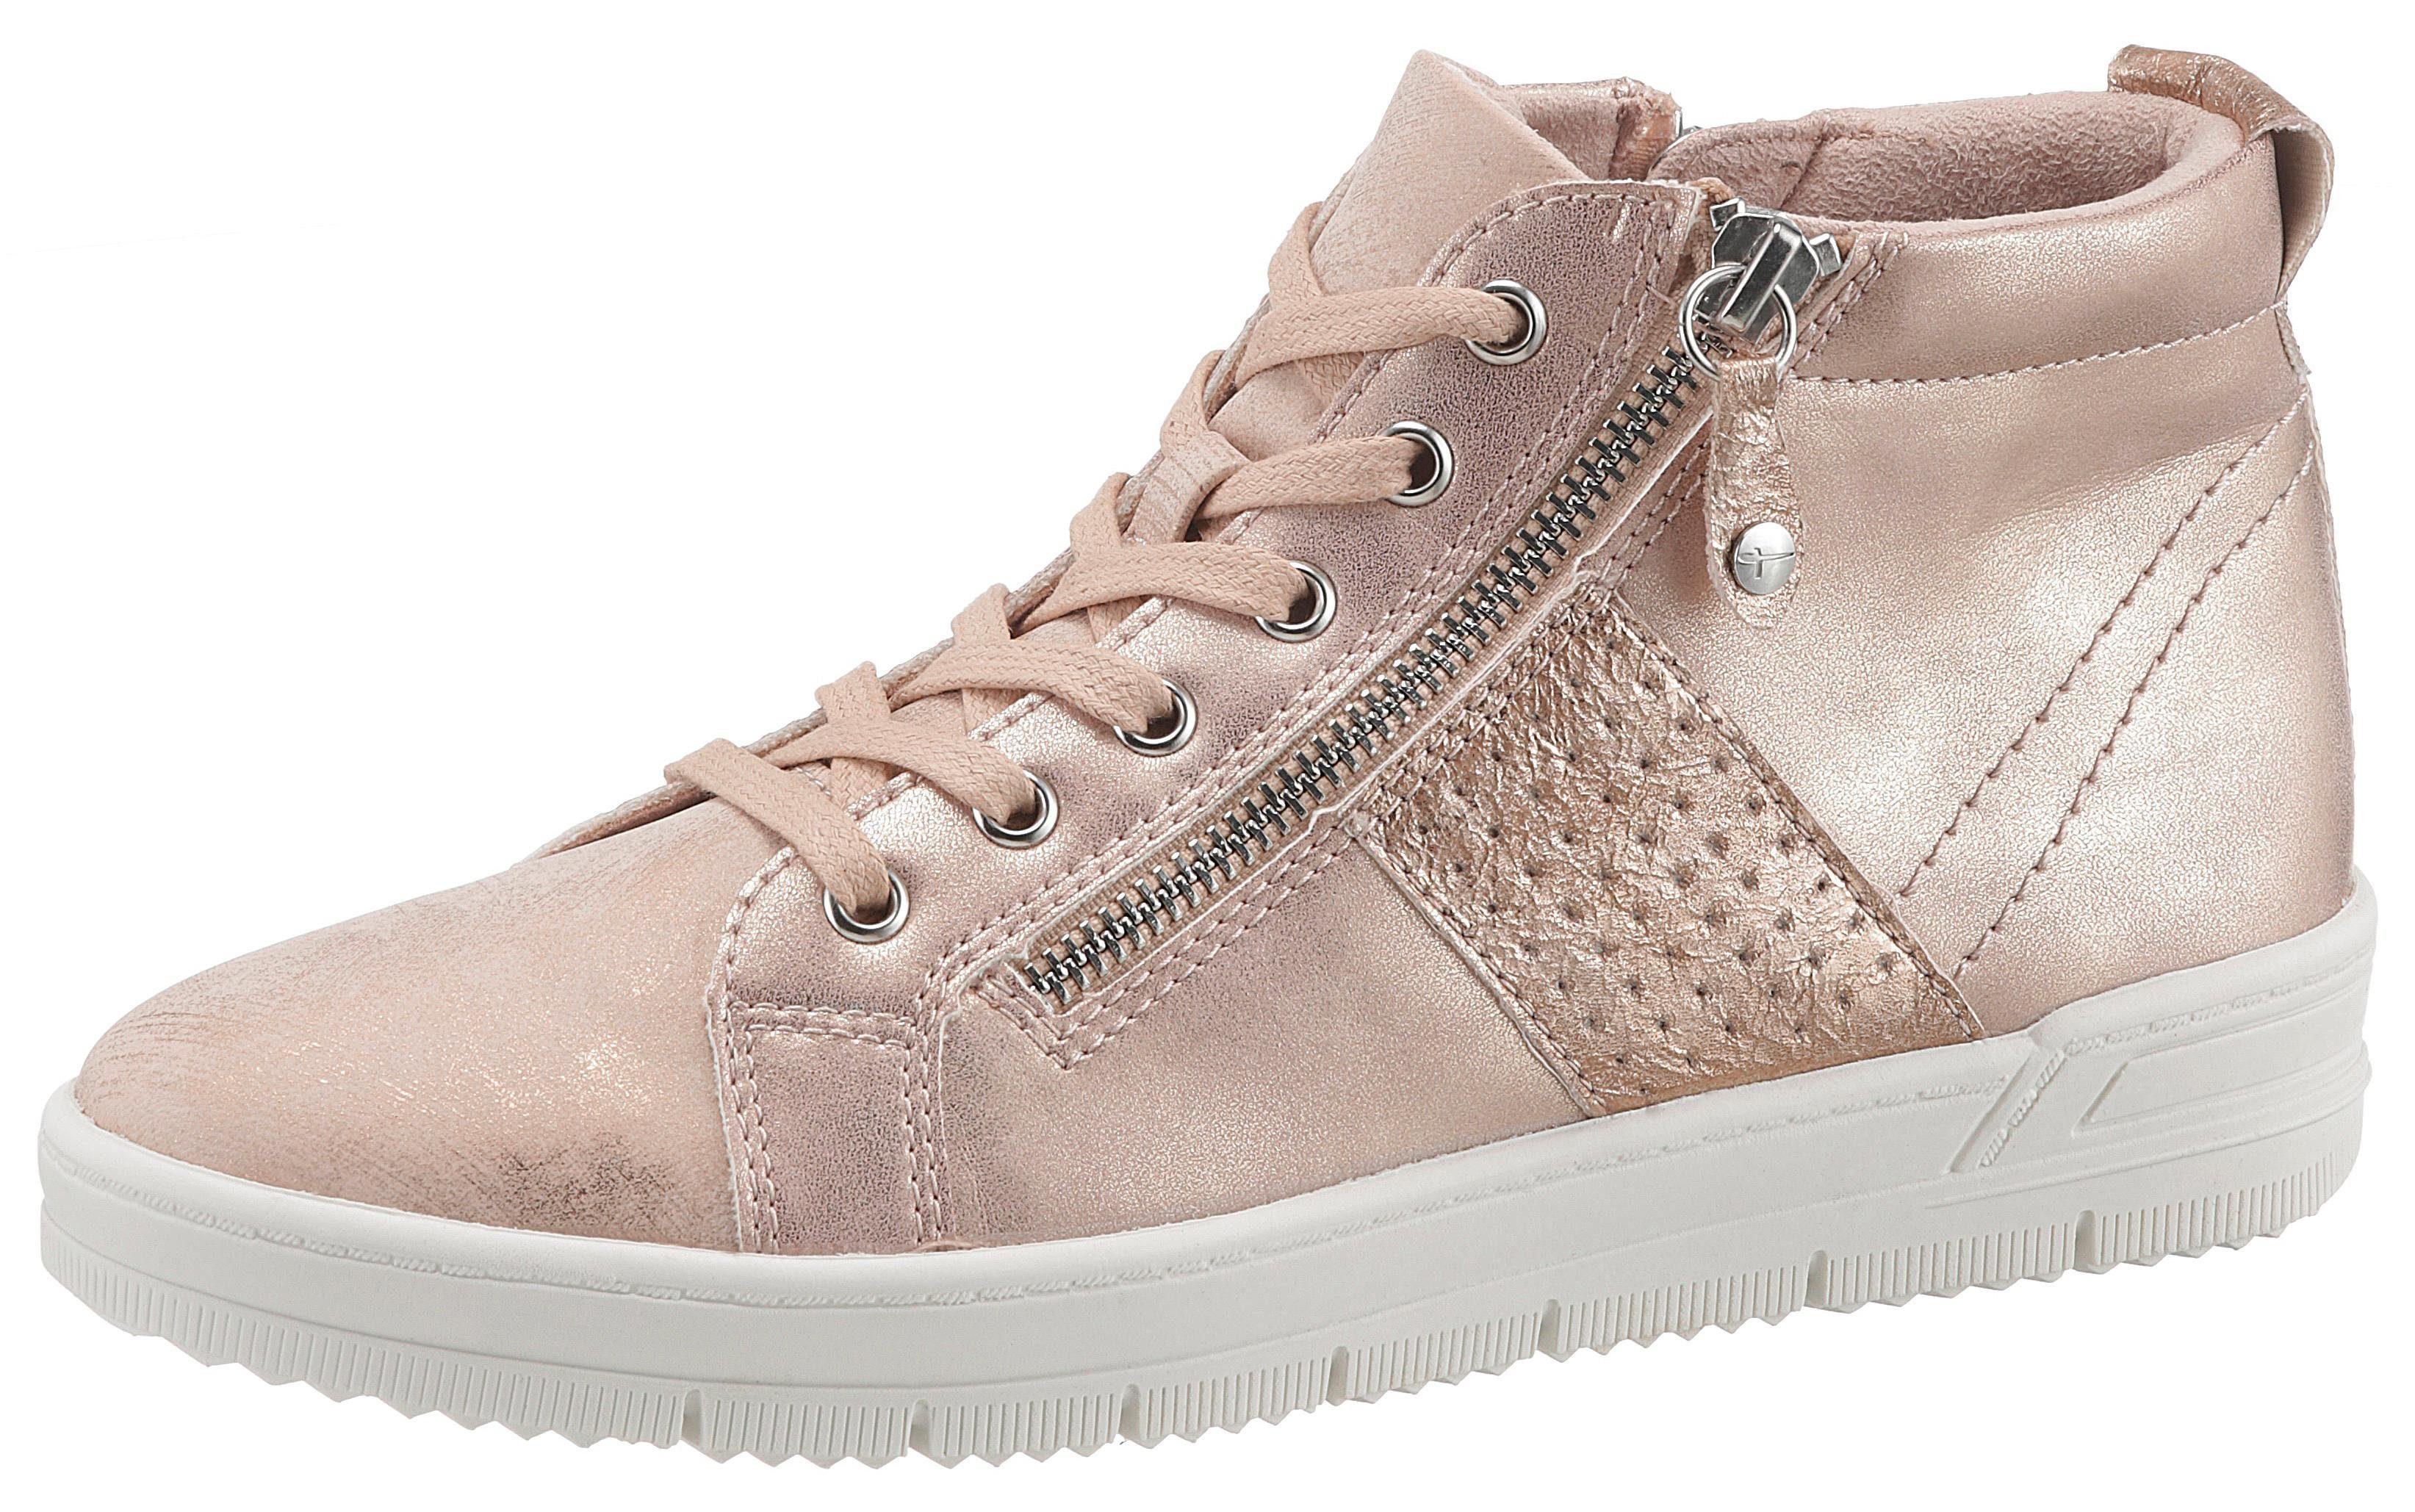 Tamaris Sneaker im lässigen Metallic Look kaufen   OTTO